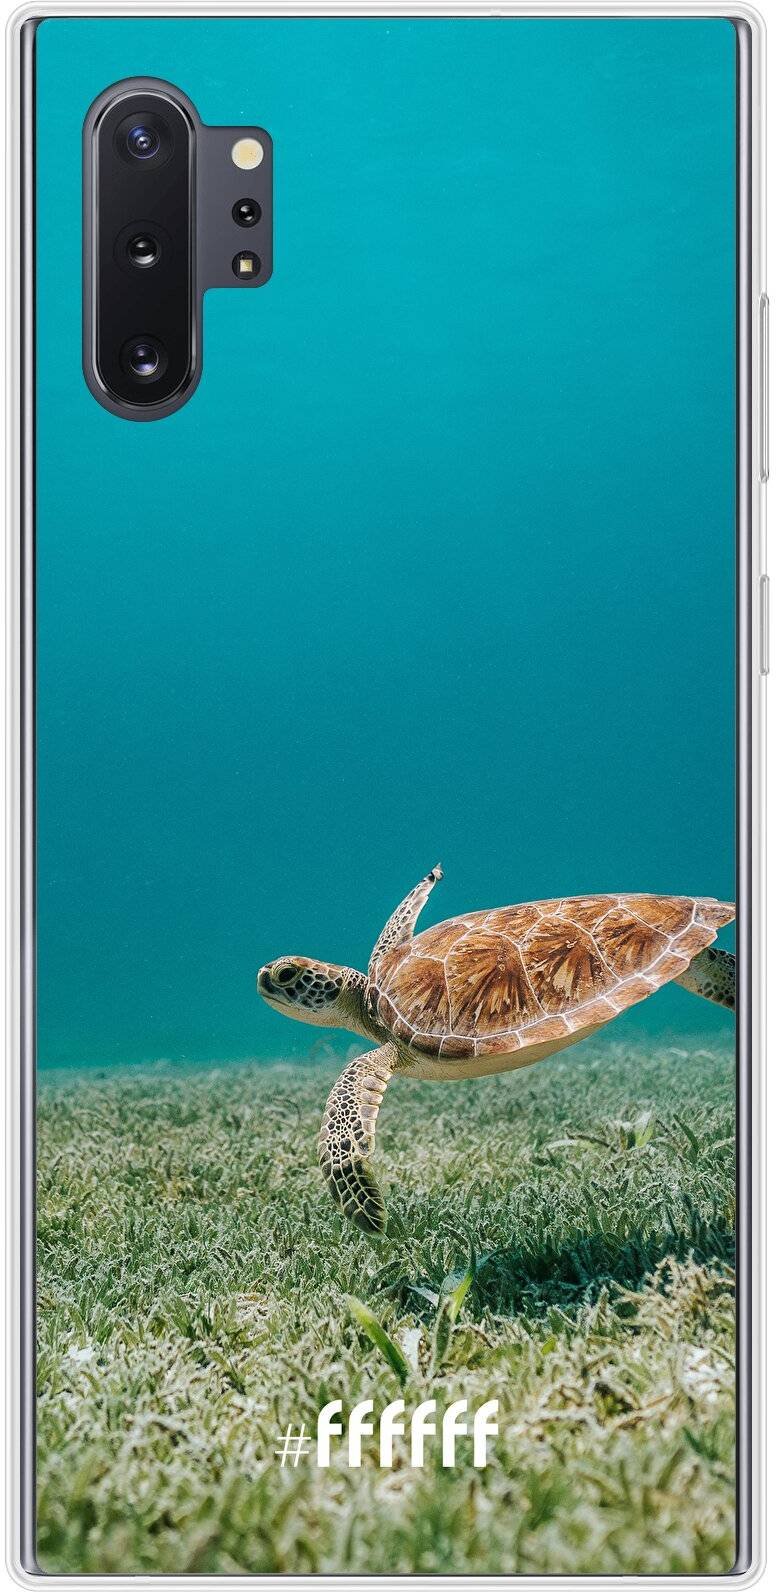 Turtle Galaxy Note 10 Plus